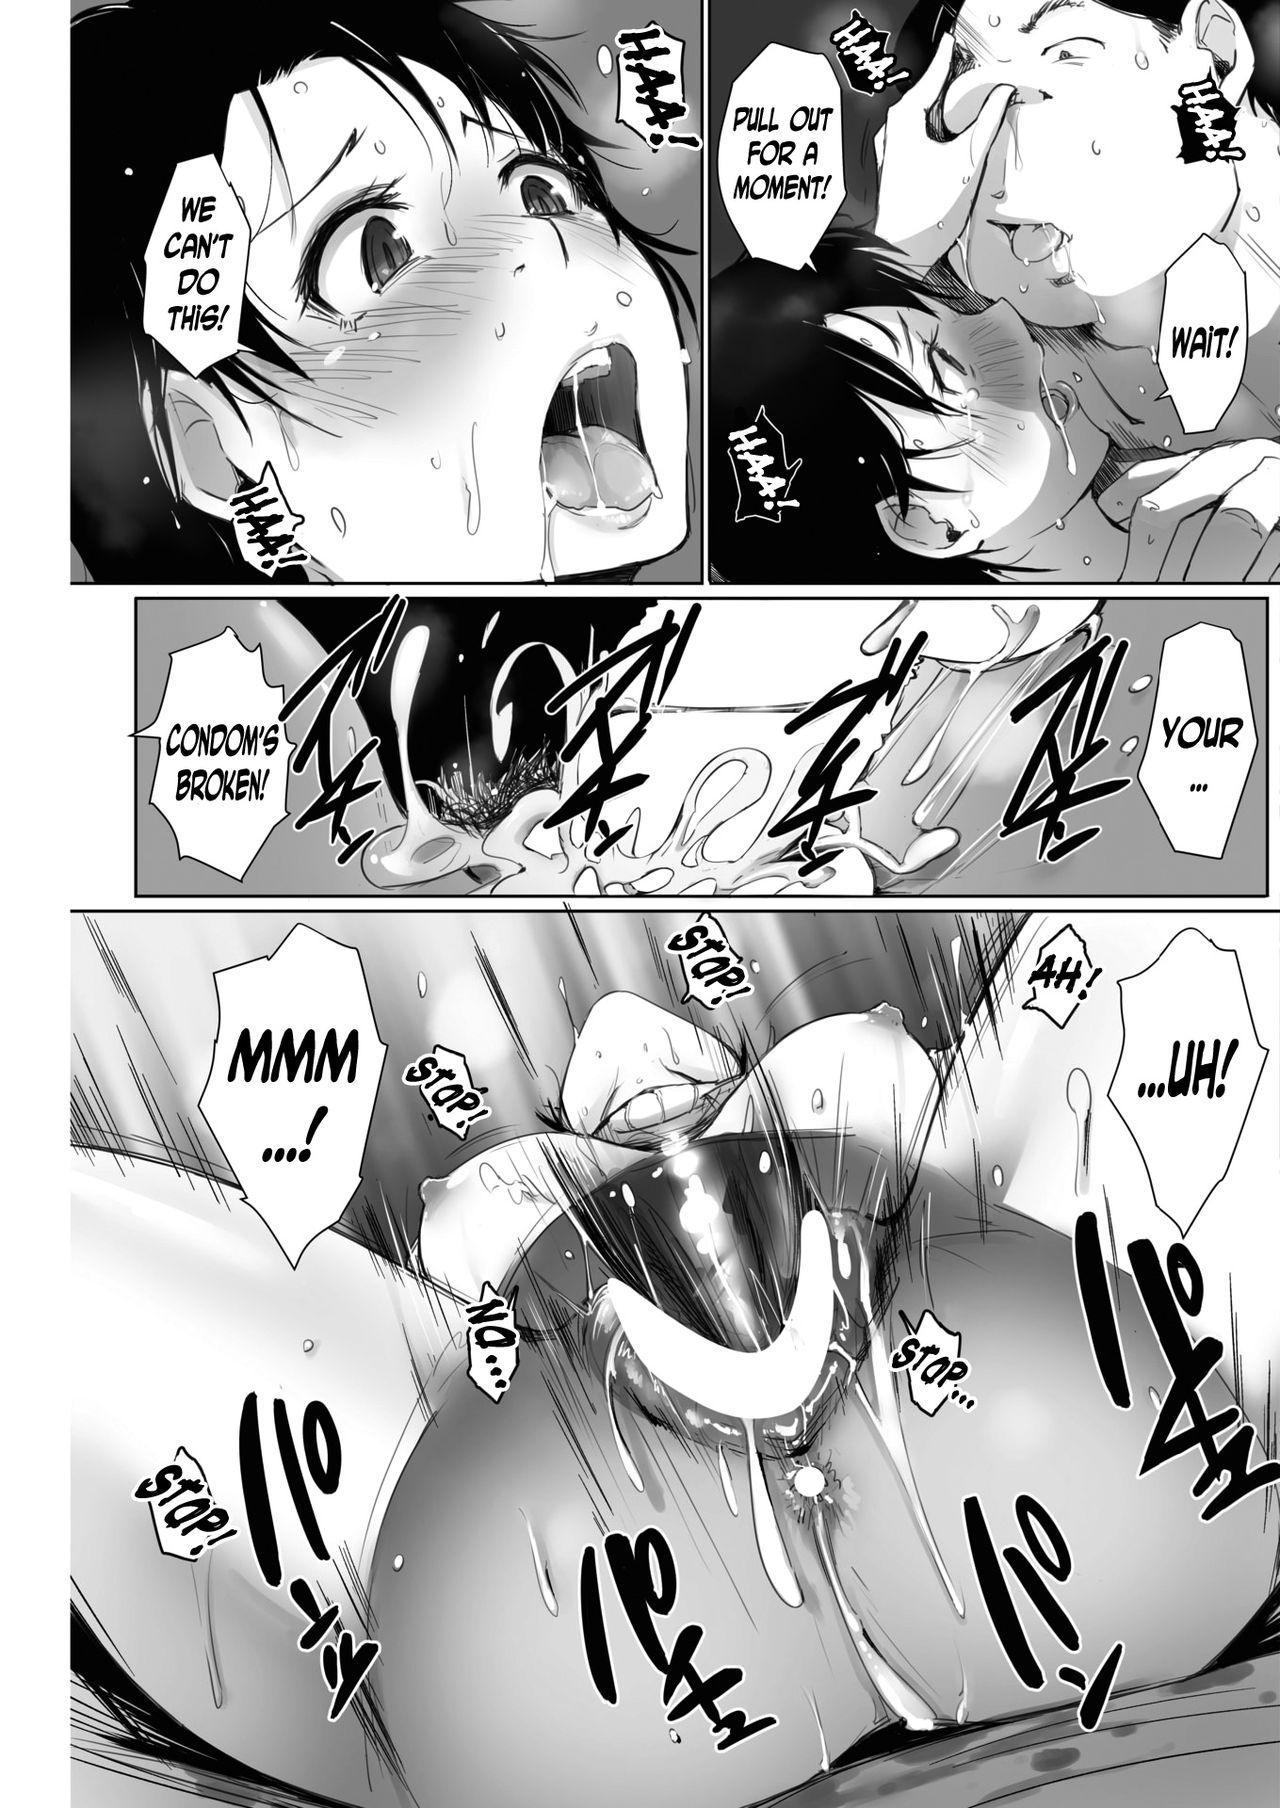 Hitozuma wa 2-do Okasareru 16